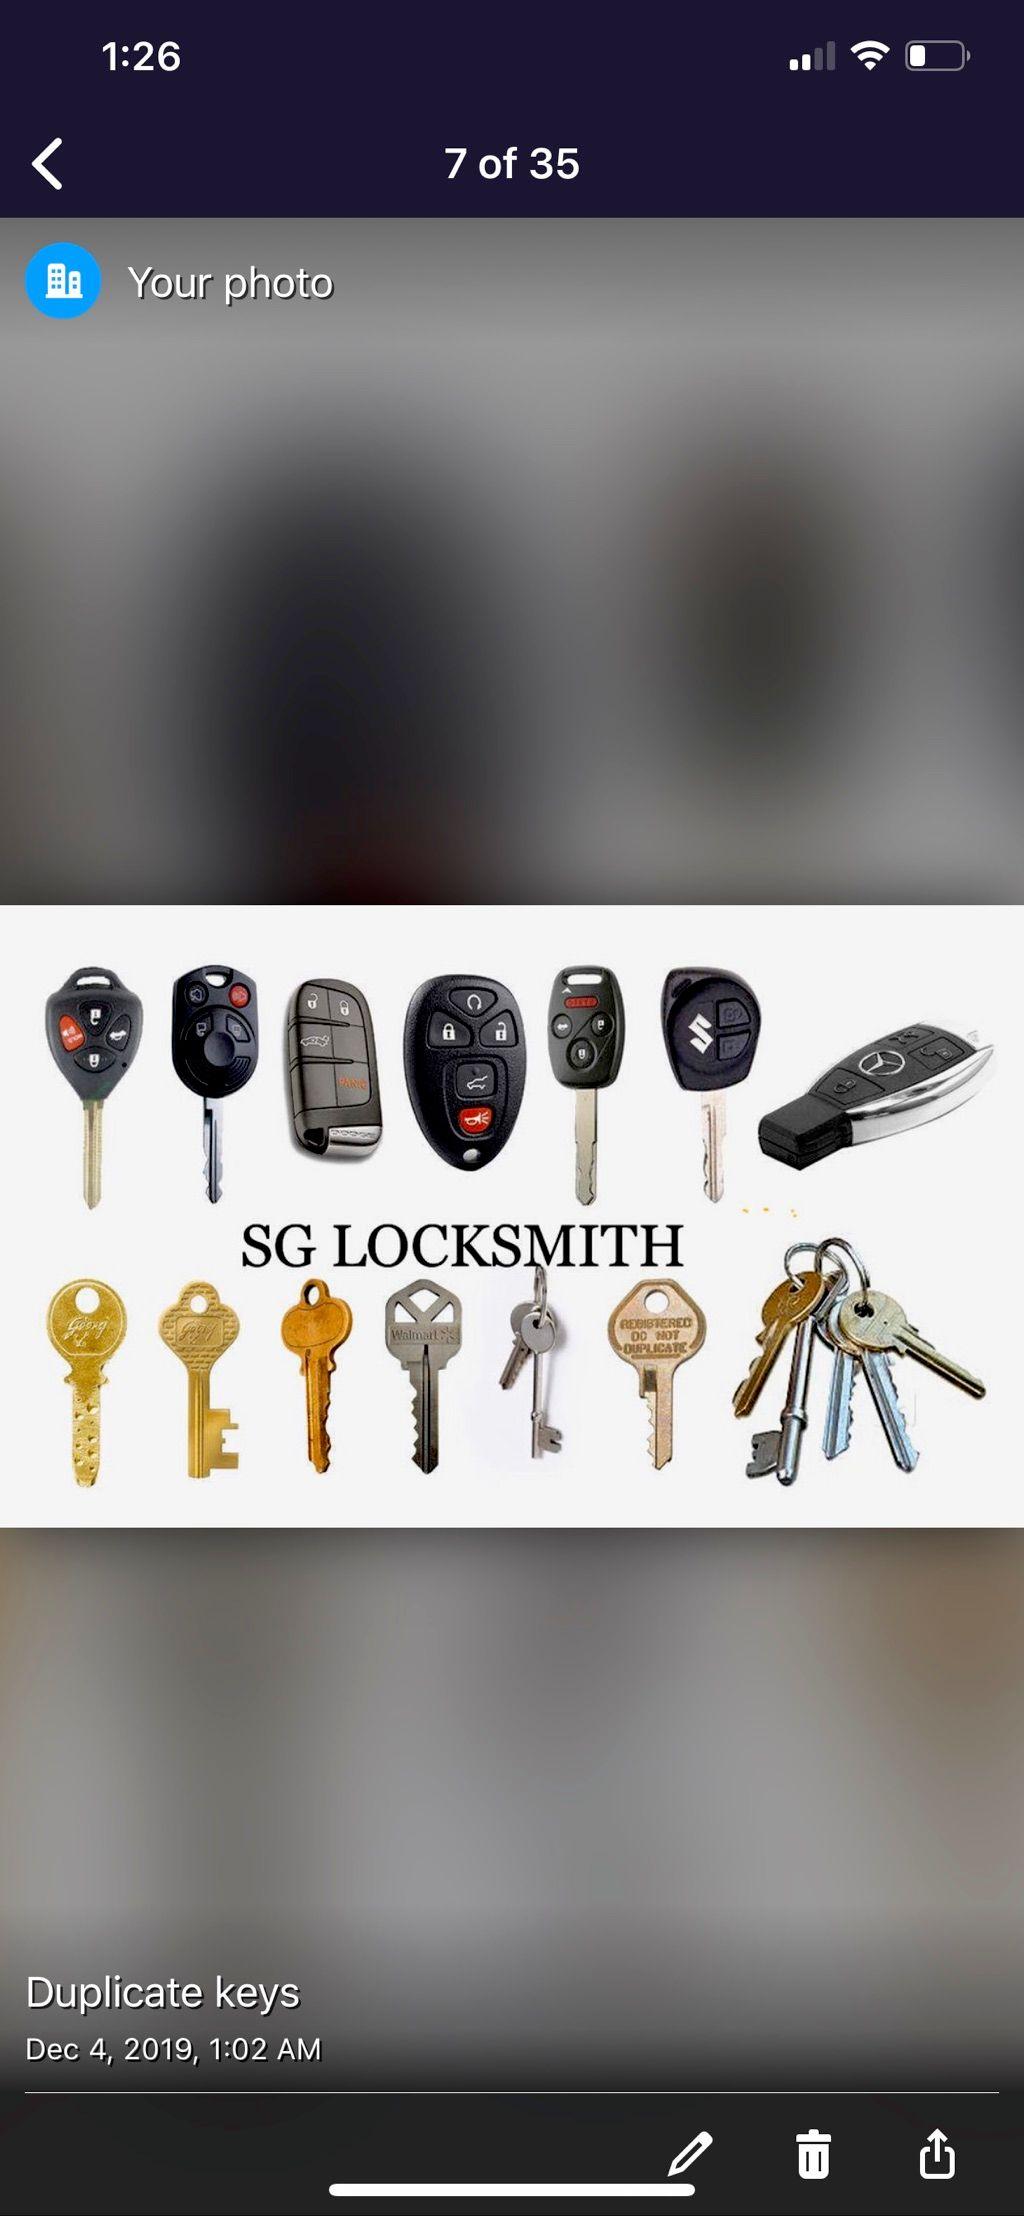 SG locksmith